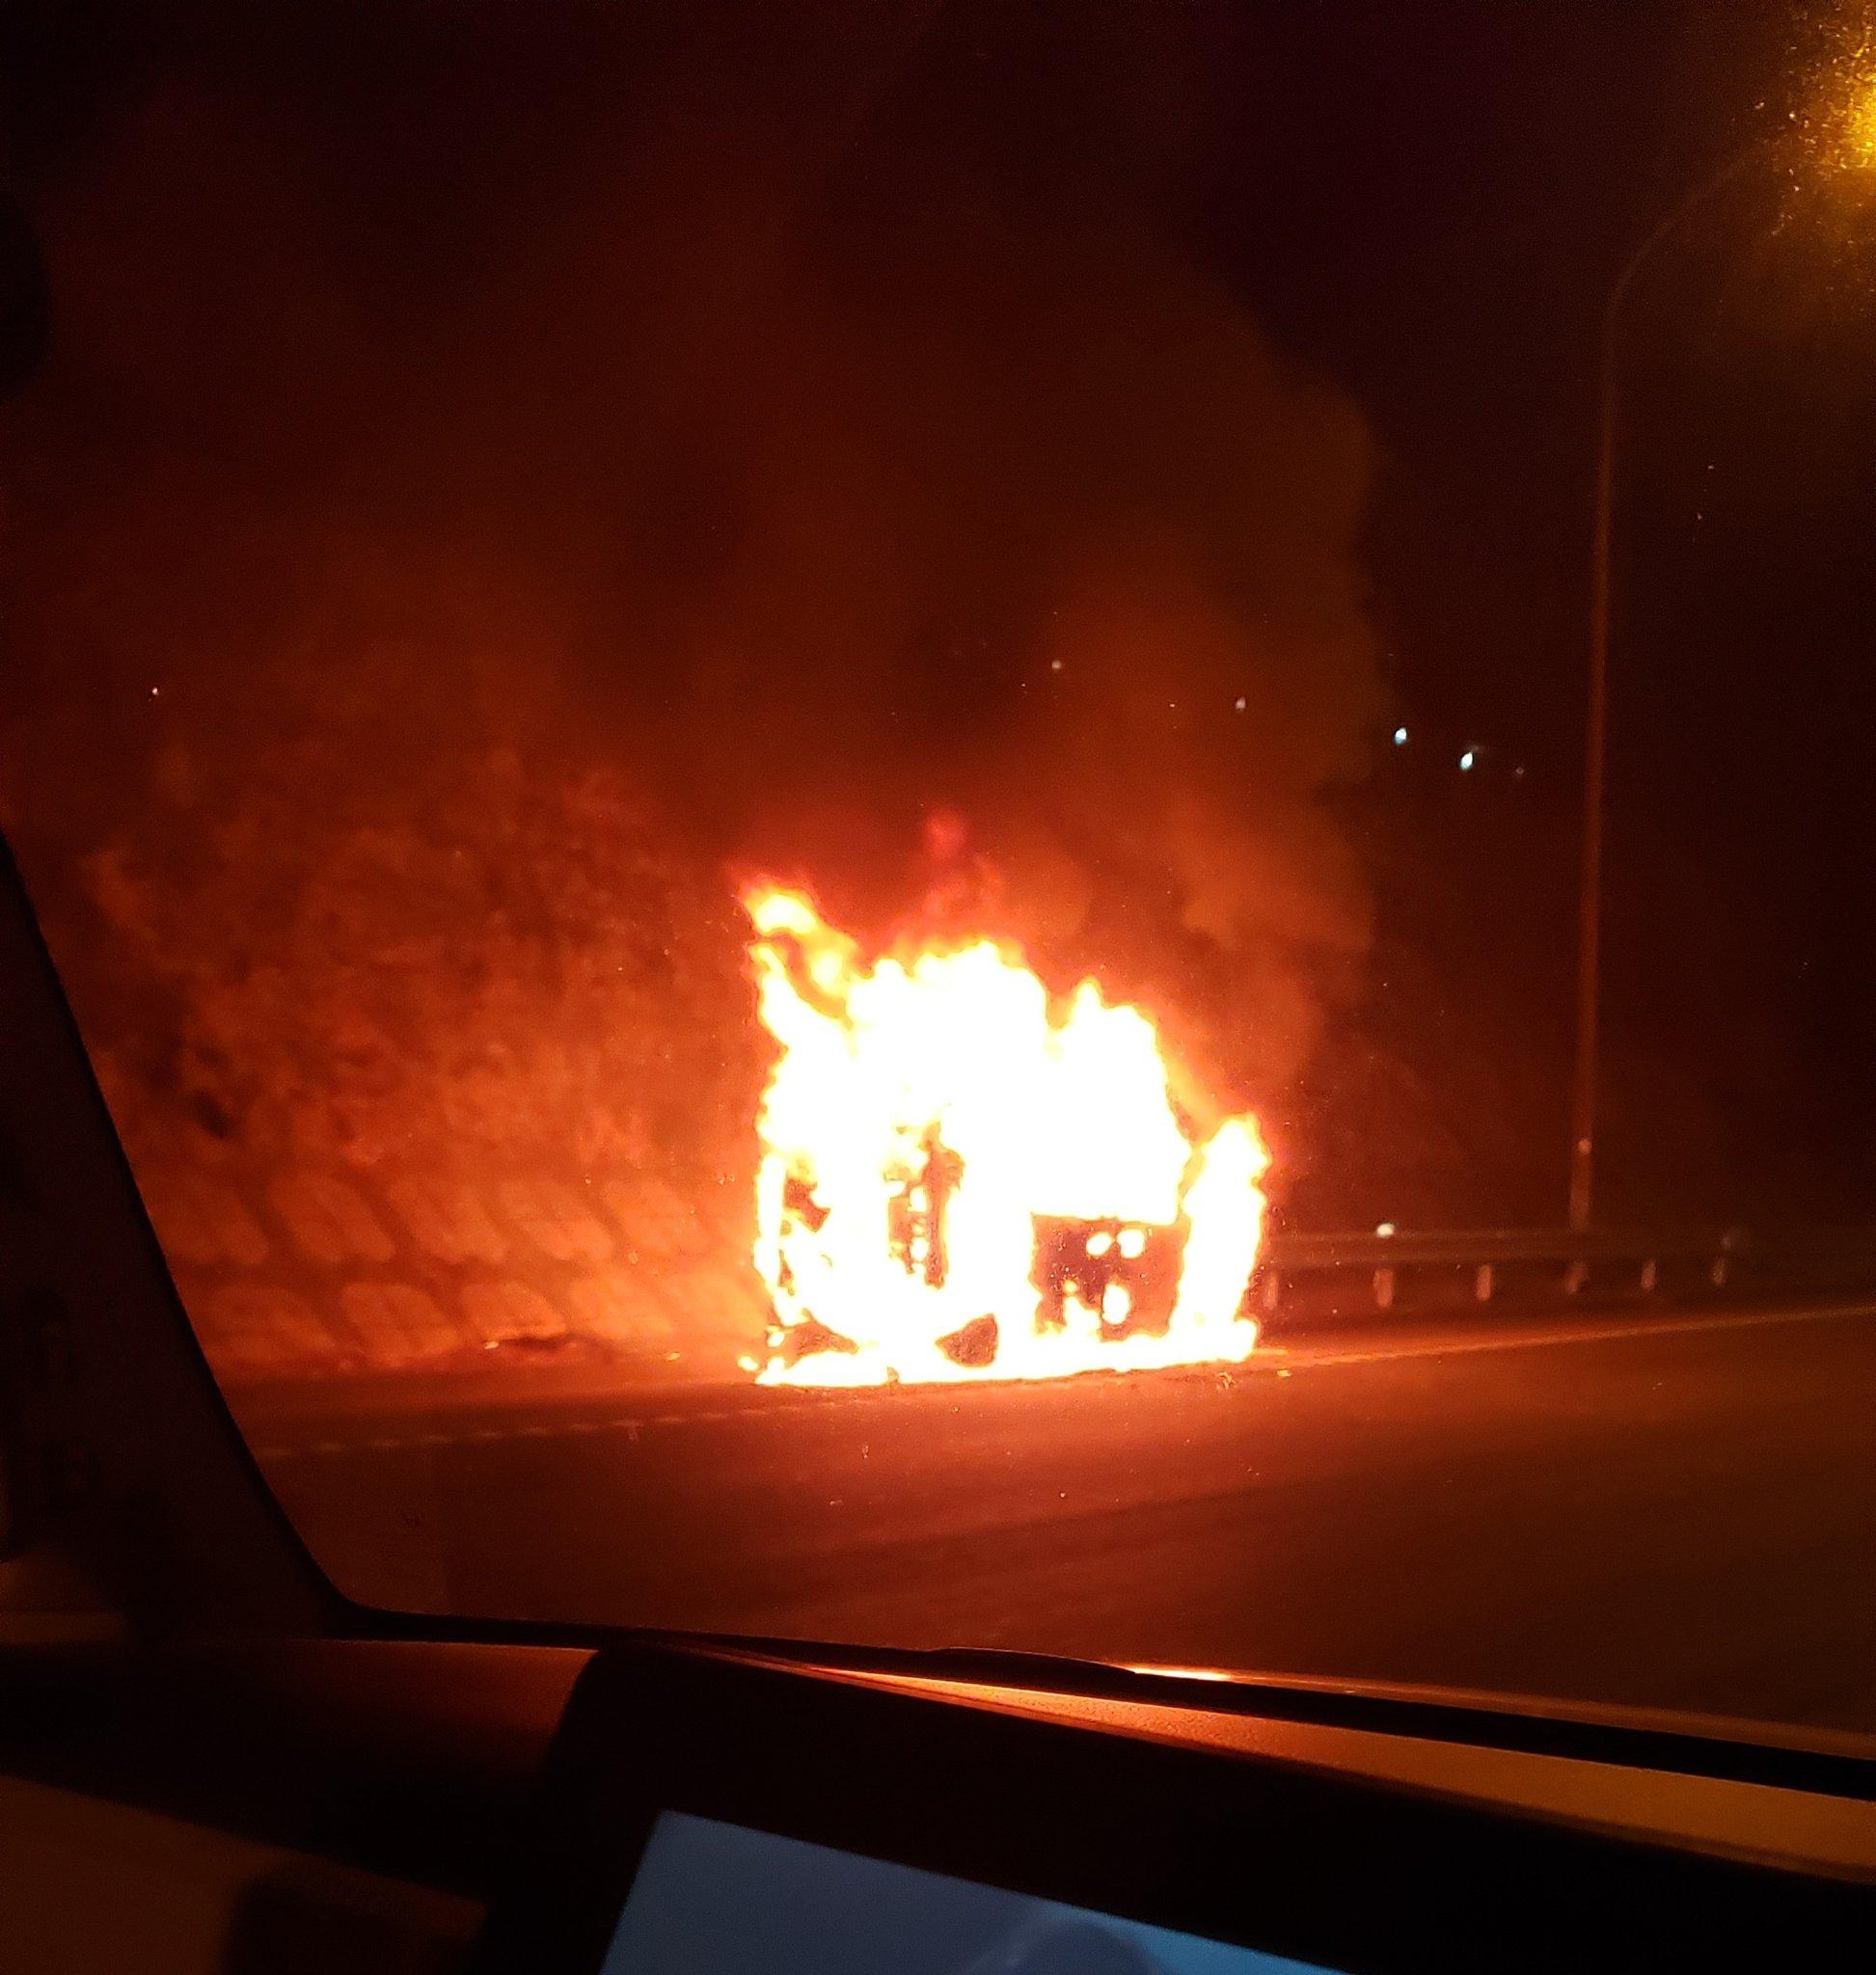 東名高速の車両火災の現場画像